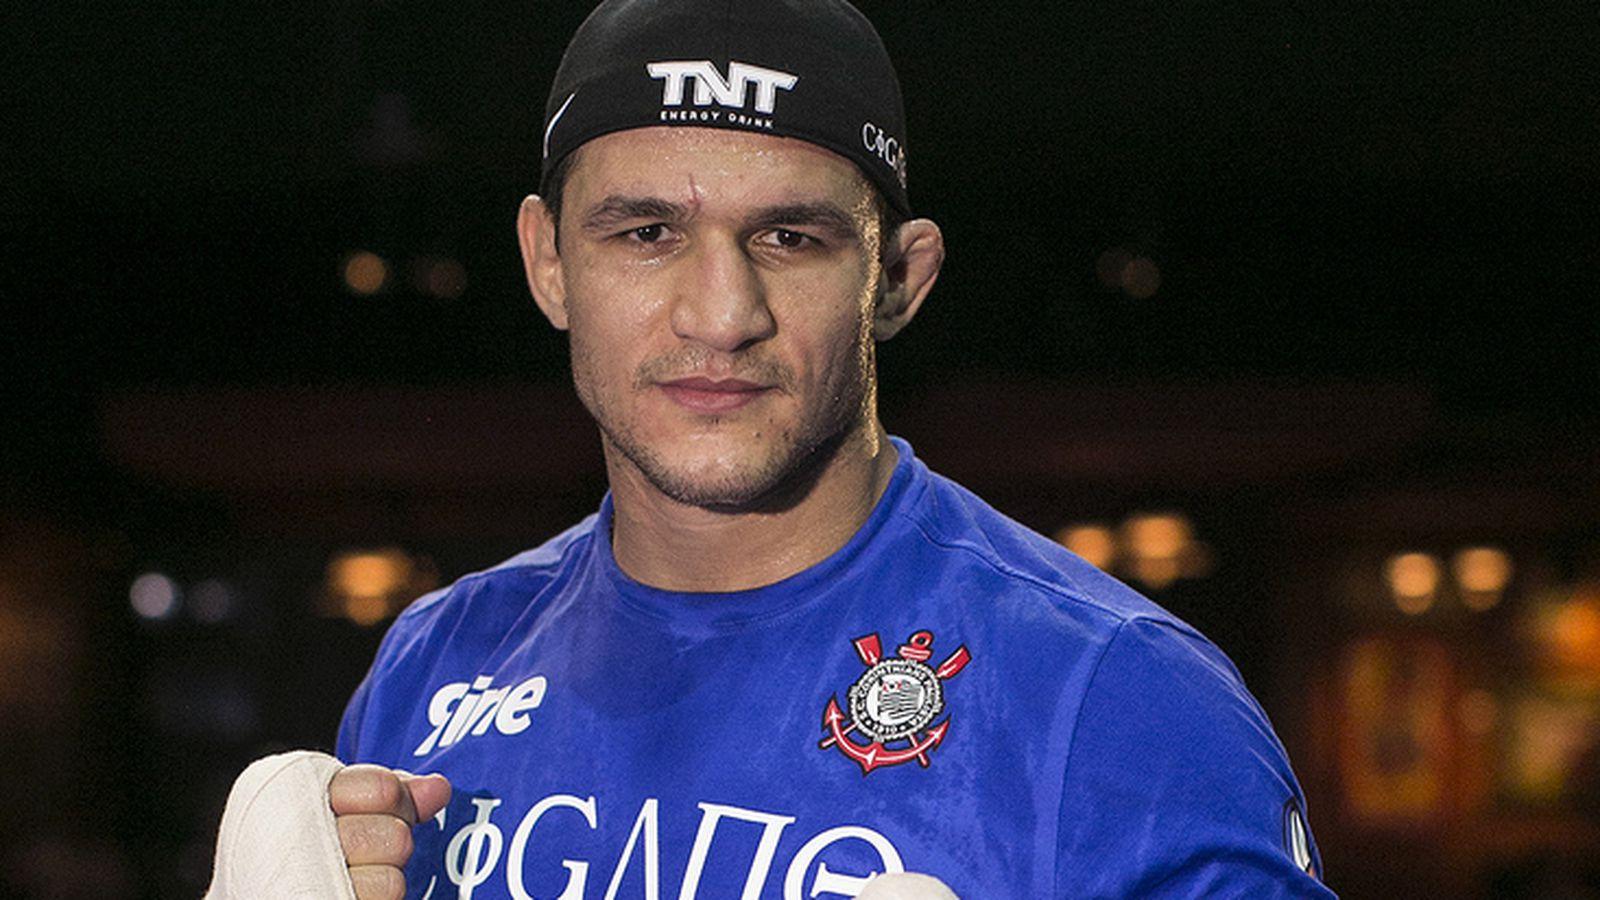 Junior dos Santos vs. Stipe Miocic headlines UFC on FOX 13 ...